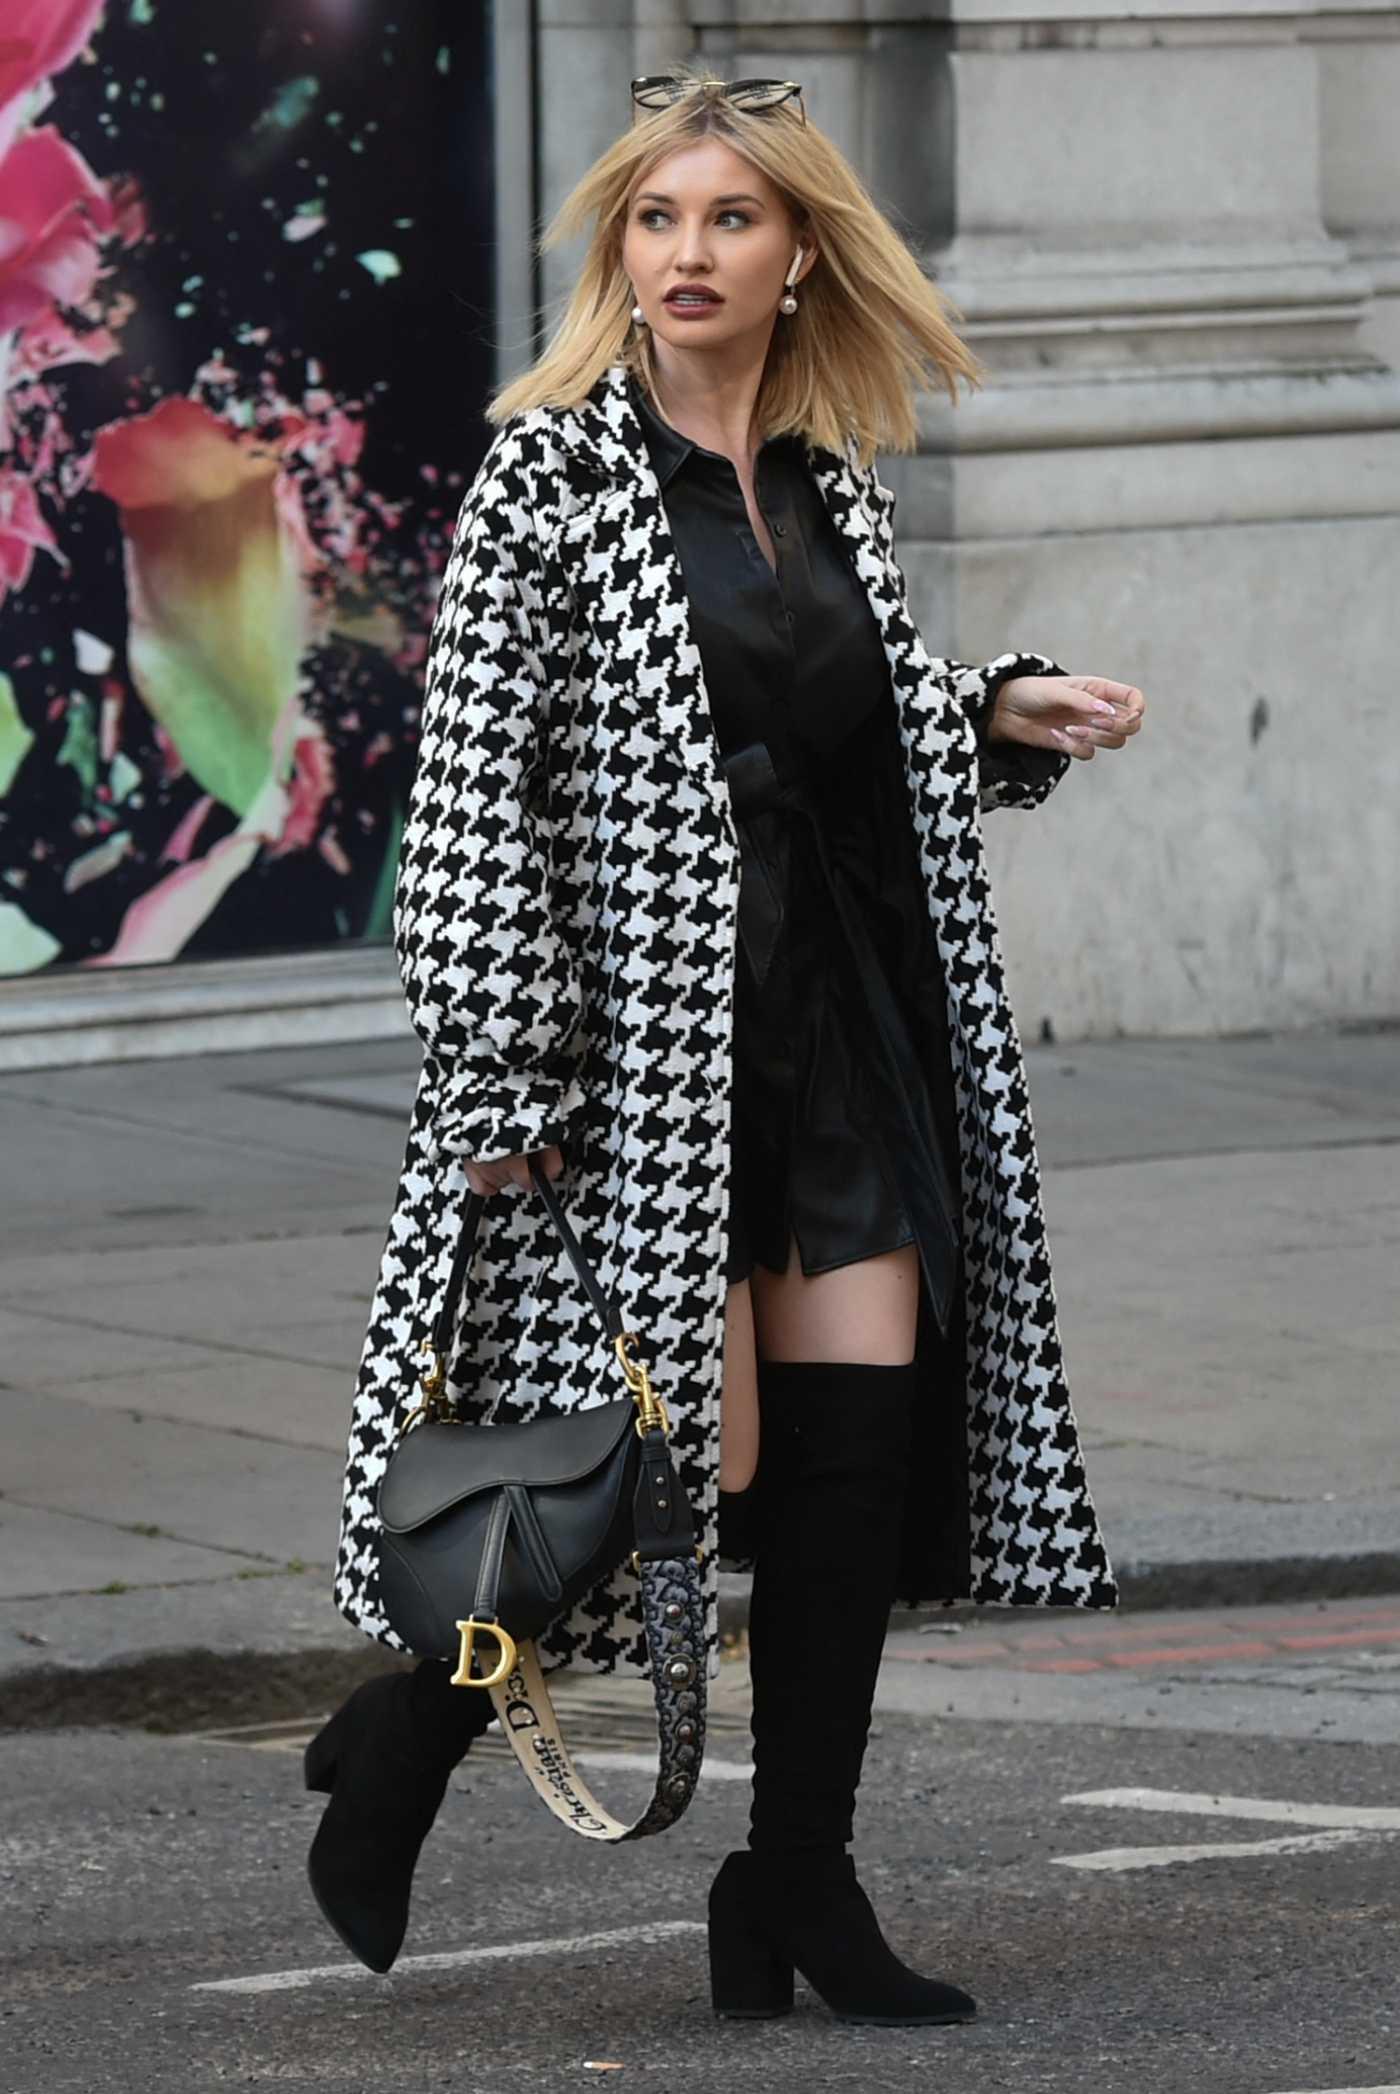 Amy Hart in a Black Mini Dress Was Seen Out in London 04/25/2021